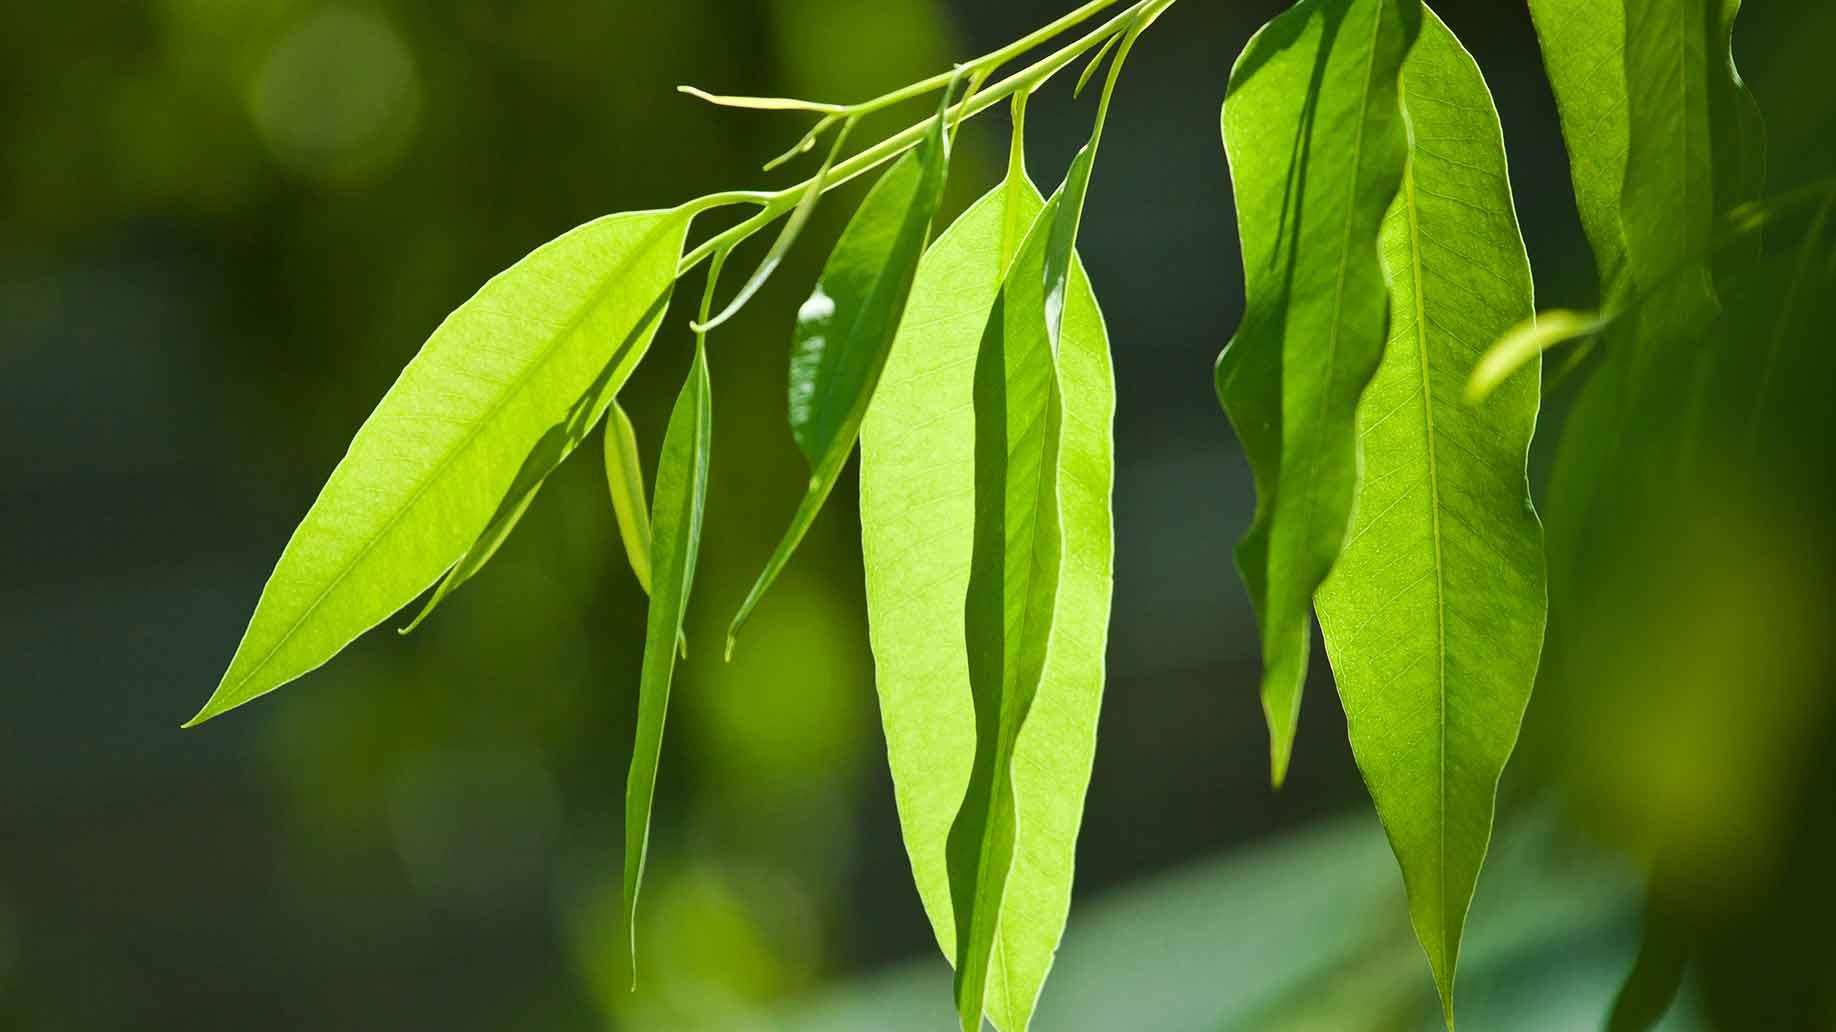 eucalyptus herb fresh green leaves